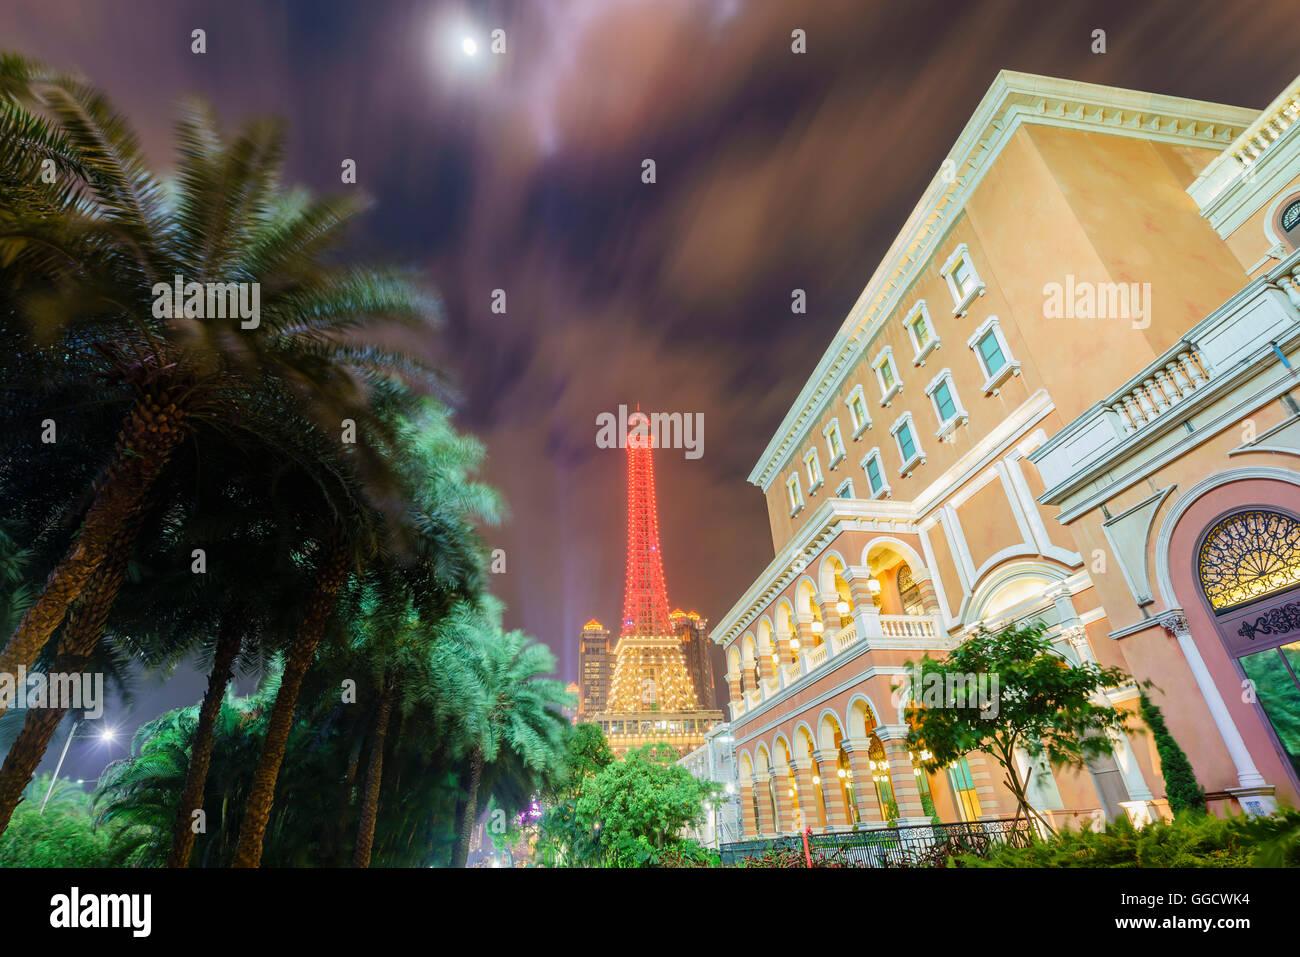 Macau, MAY18: The beautiful building of The Parisian Macao on MAY 18, 2016 at Macau - Stock Image